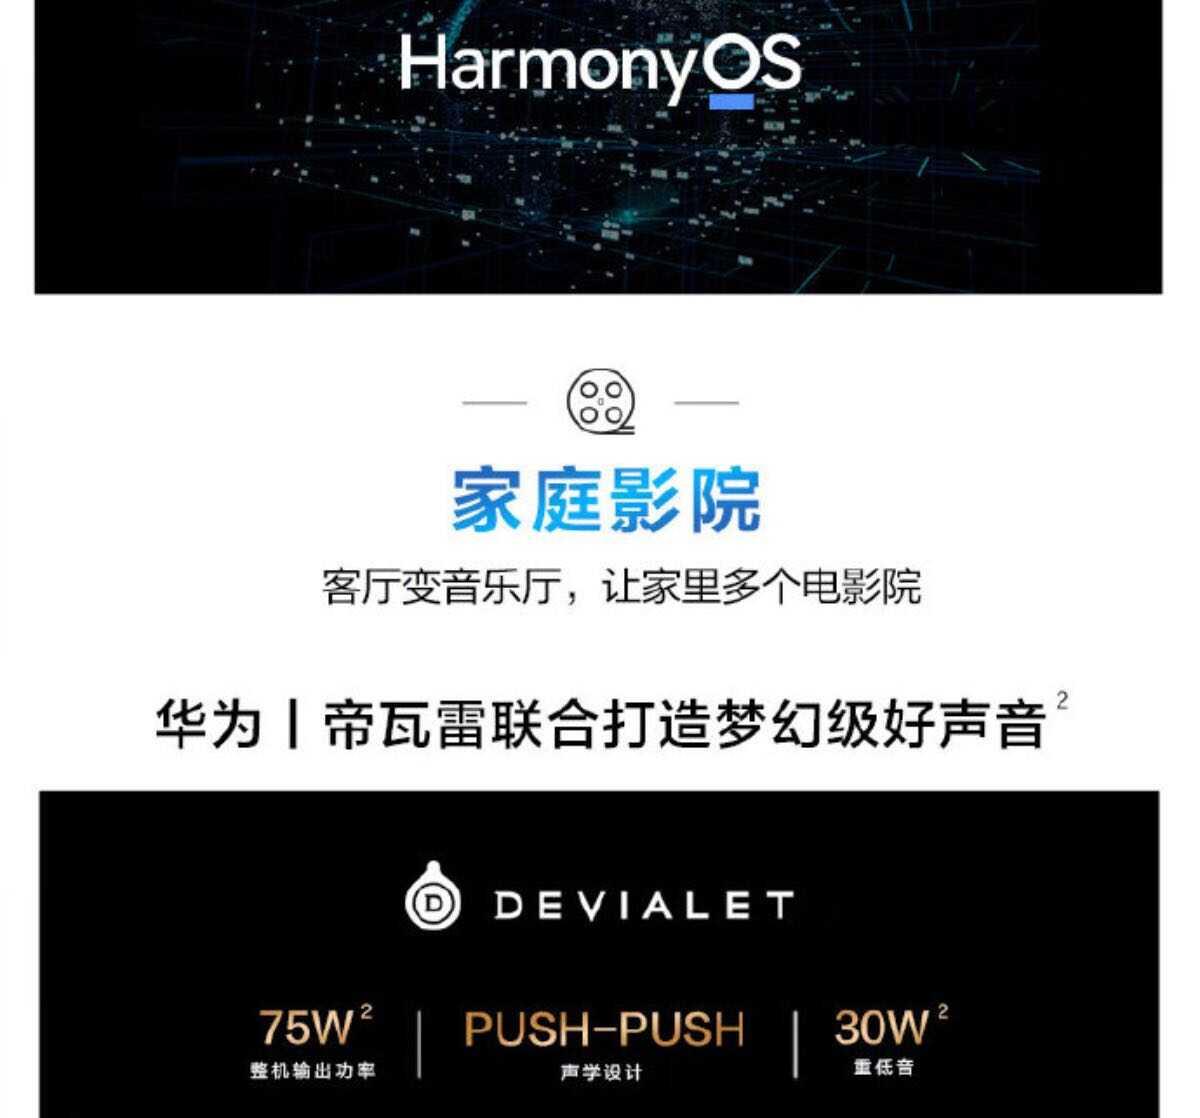 huawei smart screen tv v55 v65 v75 v85 serie v 2021 specifiche prezzo uscita 9/4 2